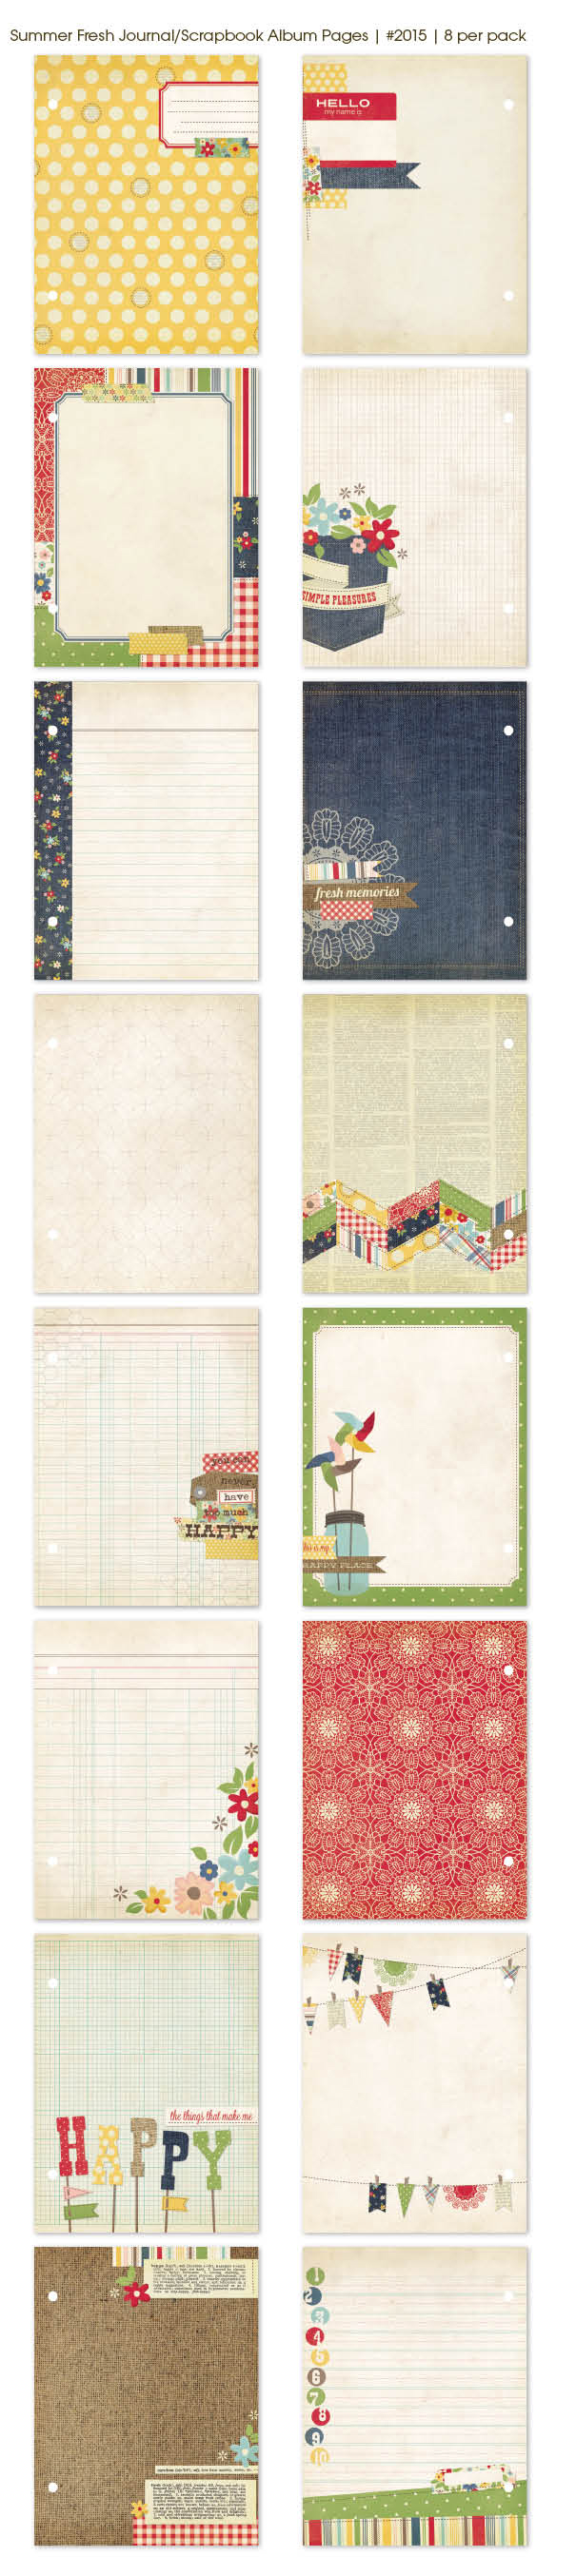 SF_Album Pages